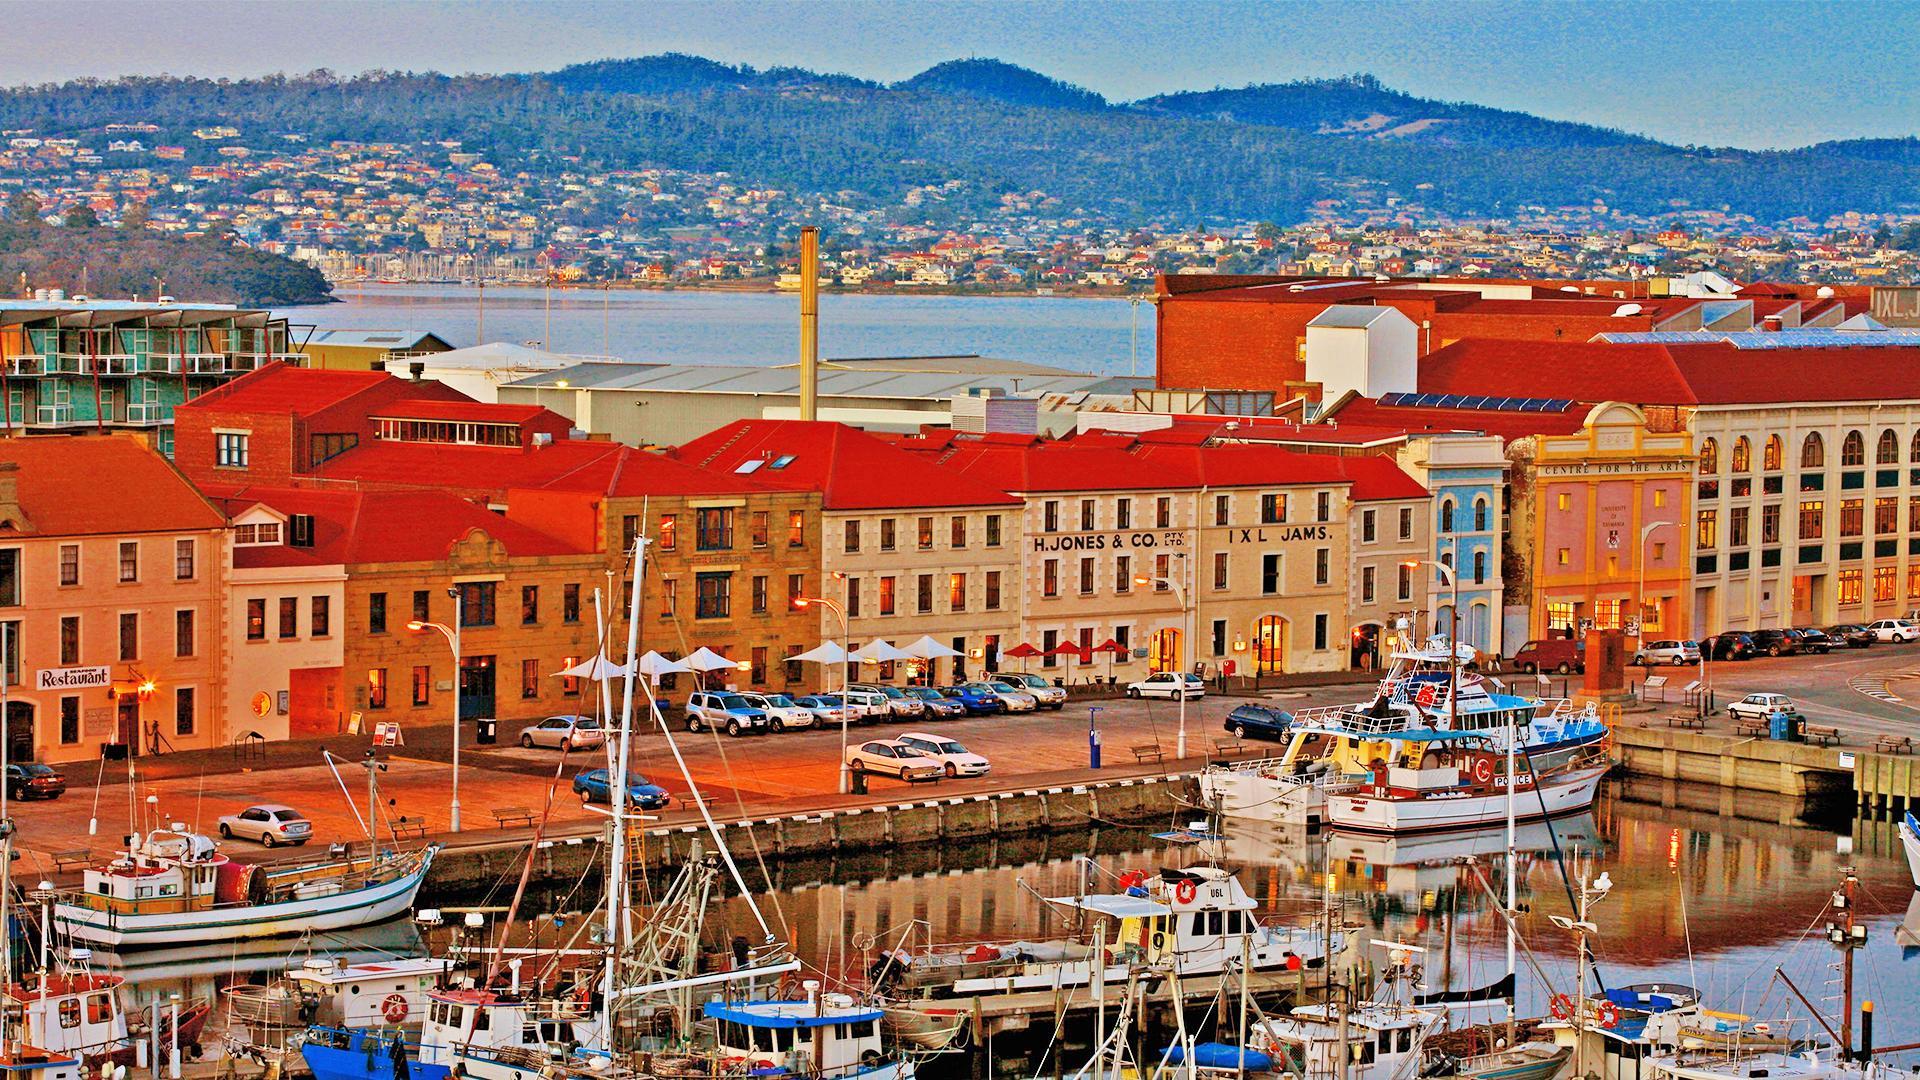 Tasmania Casino Hobart